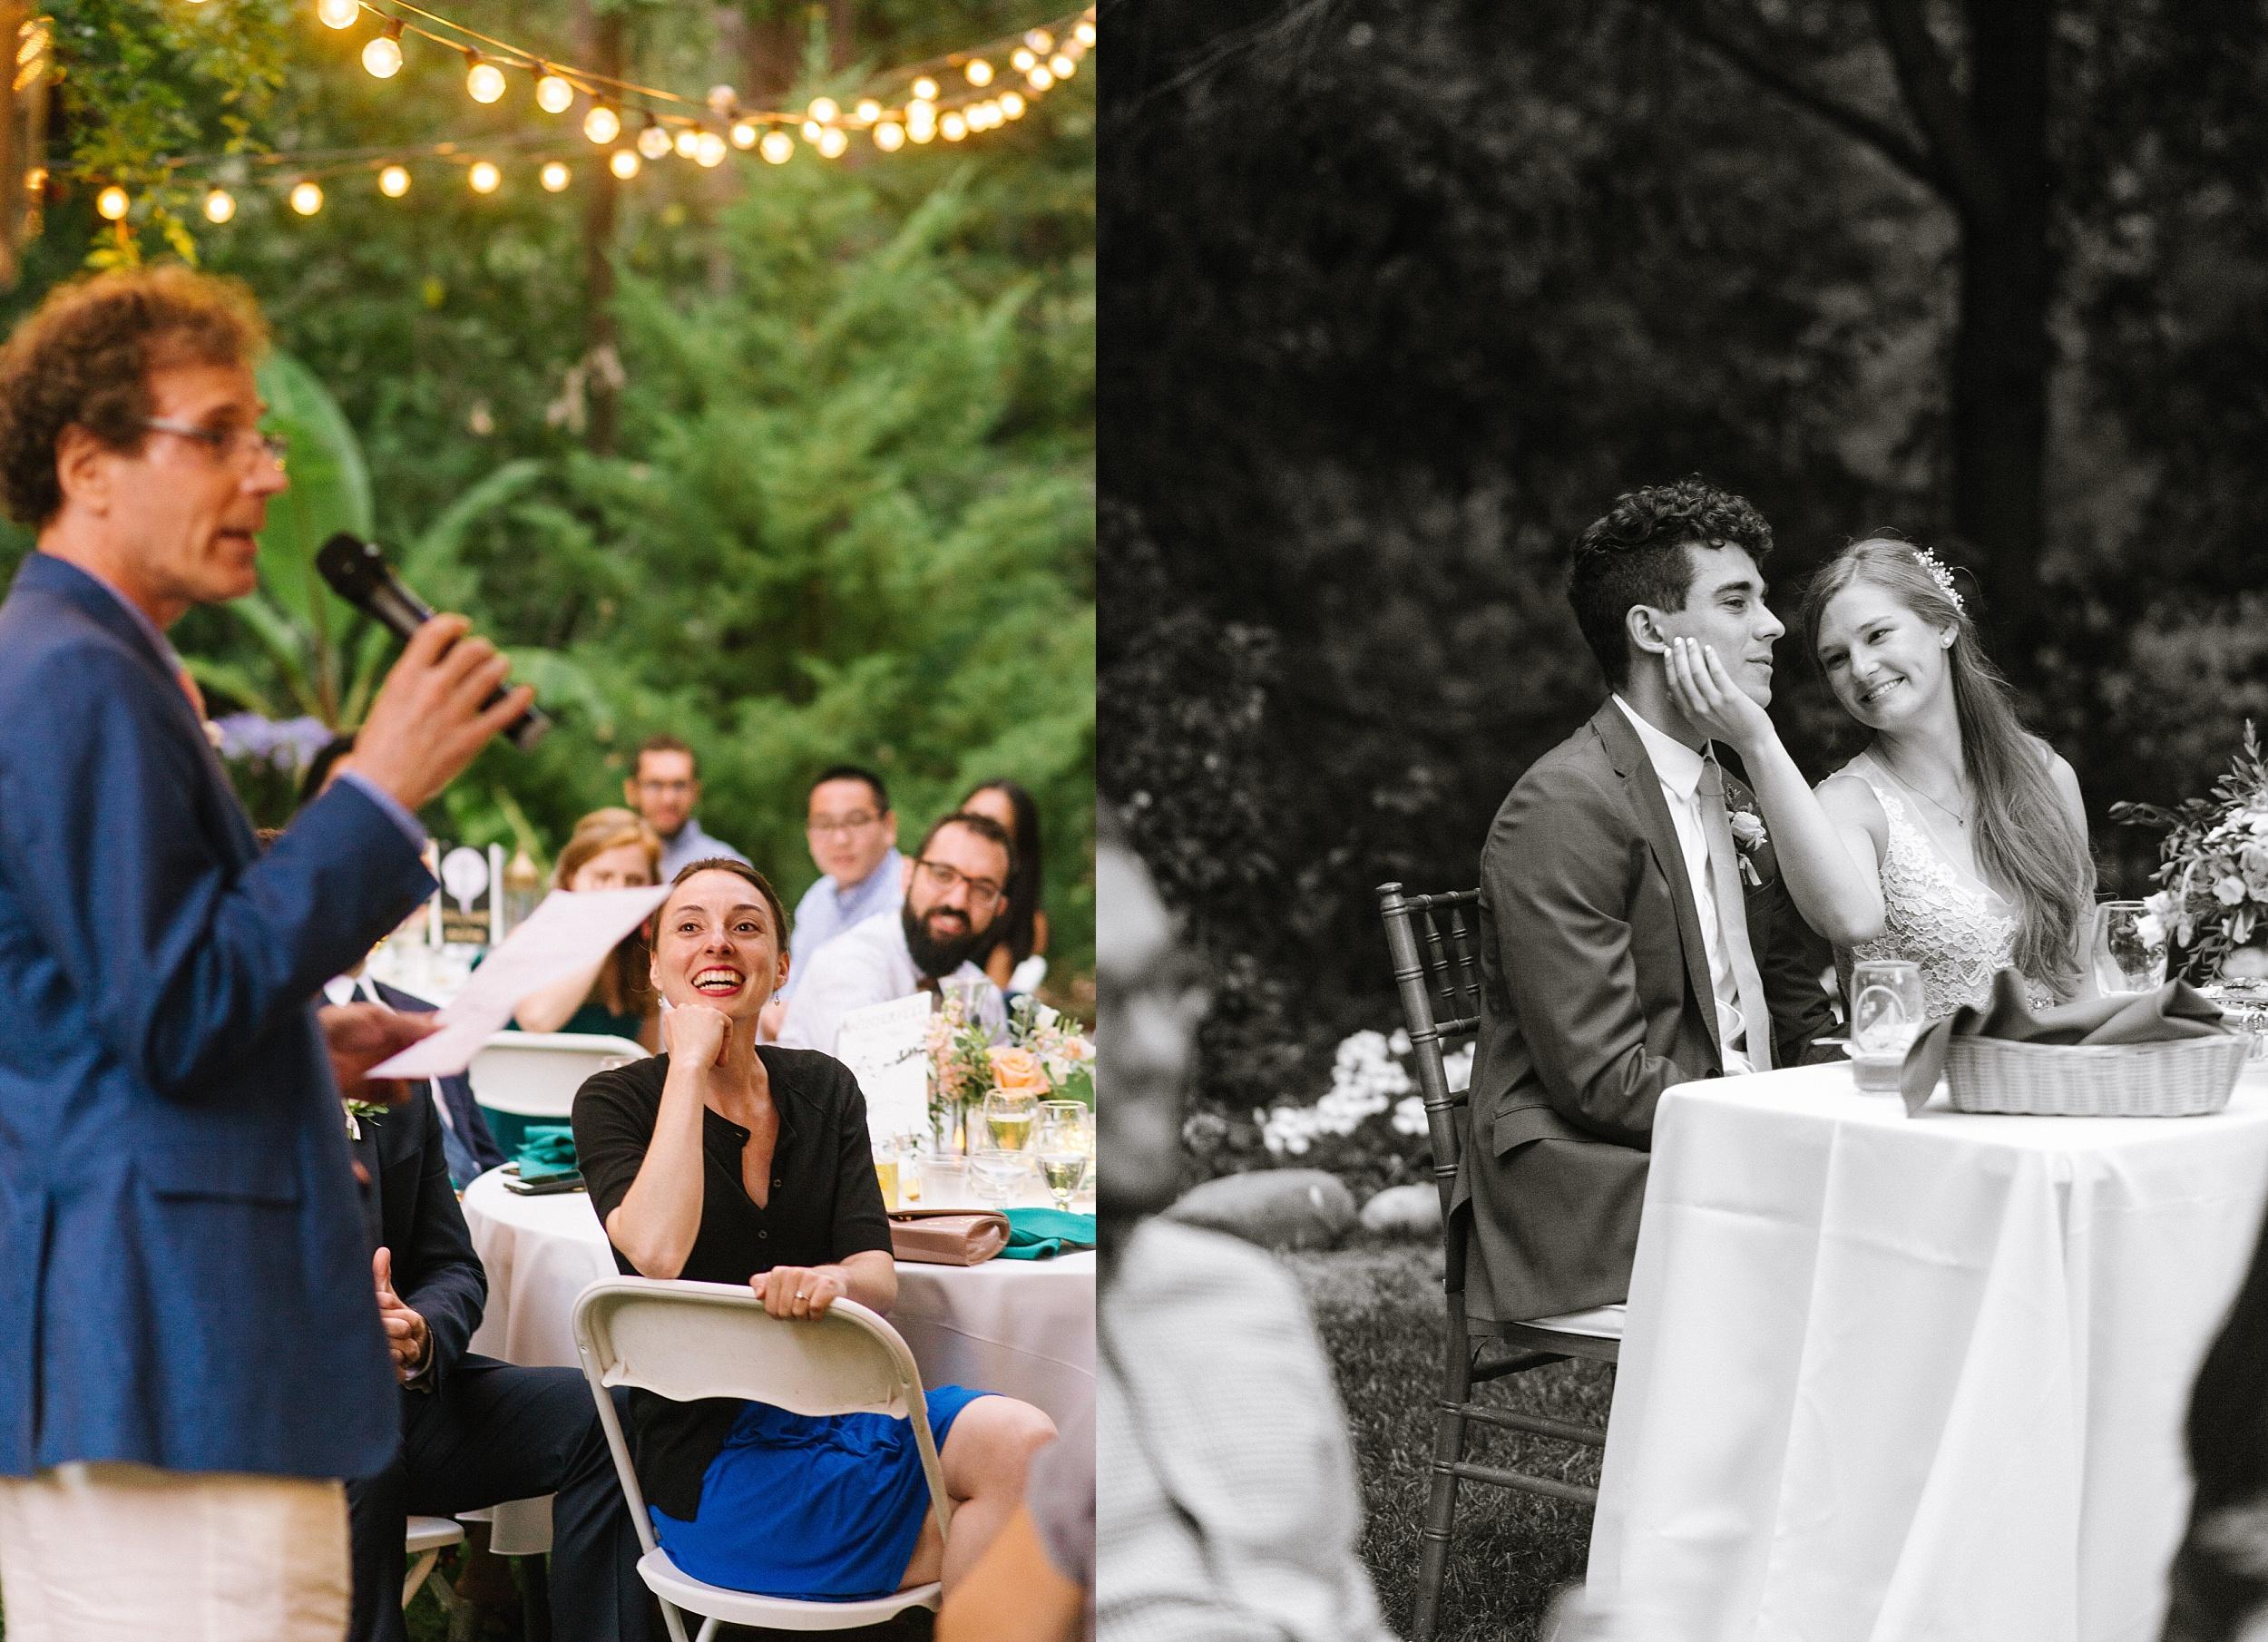 Amphitheatre-of-the-Redwoods-wedding-erikariley_chelsea-dier-photography_0041.jpg